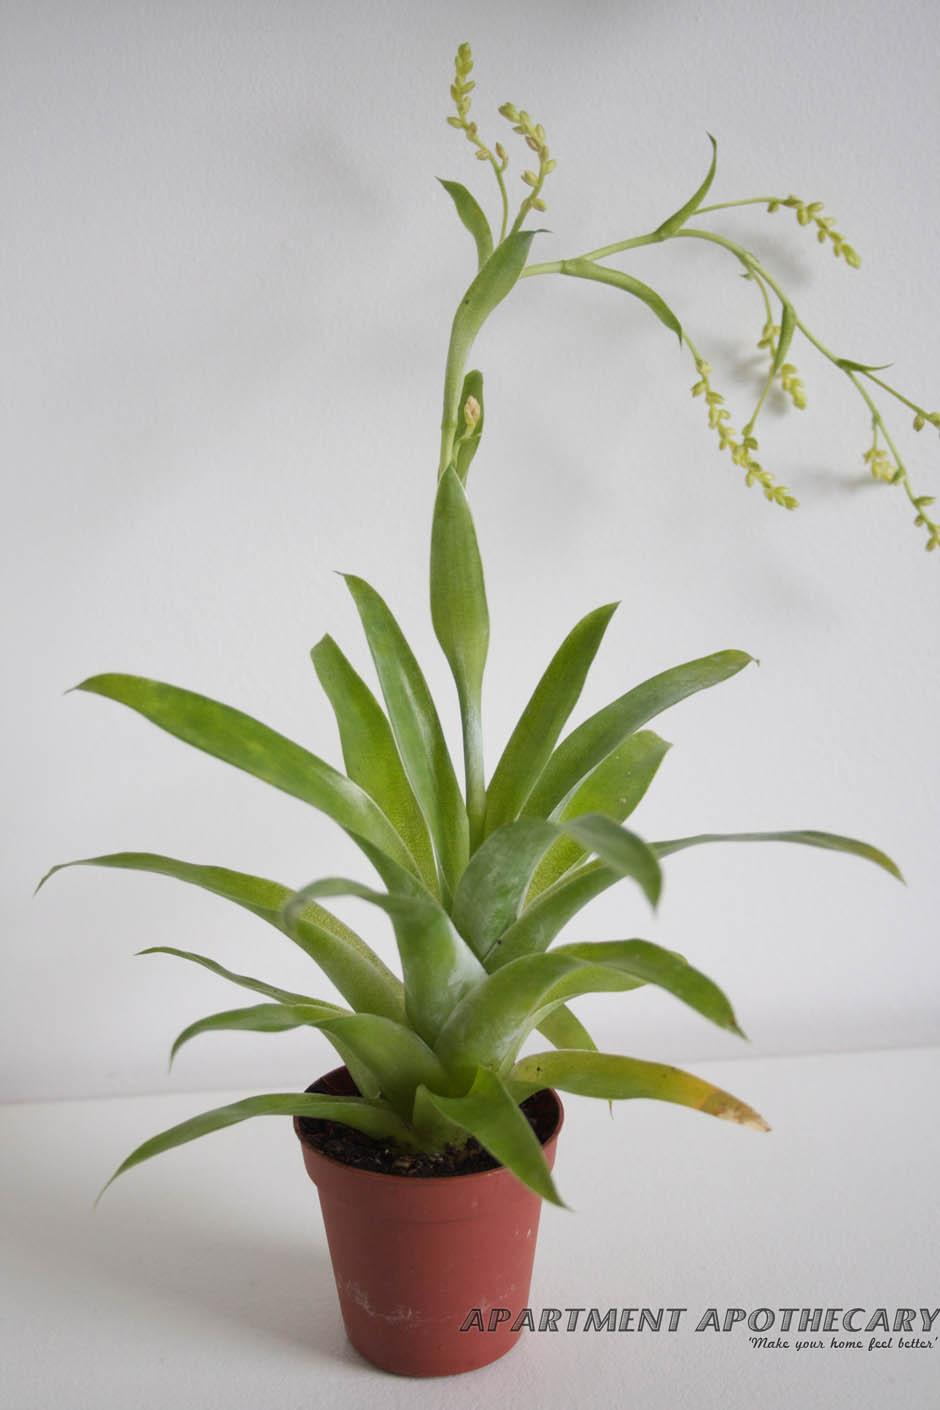 Tropical plant for terrarium Catopsis morreniana (Flowering Bromeliad)